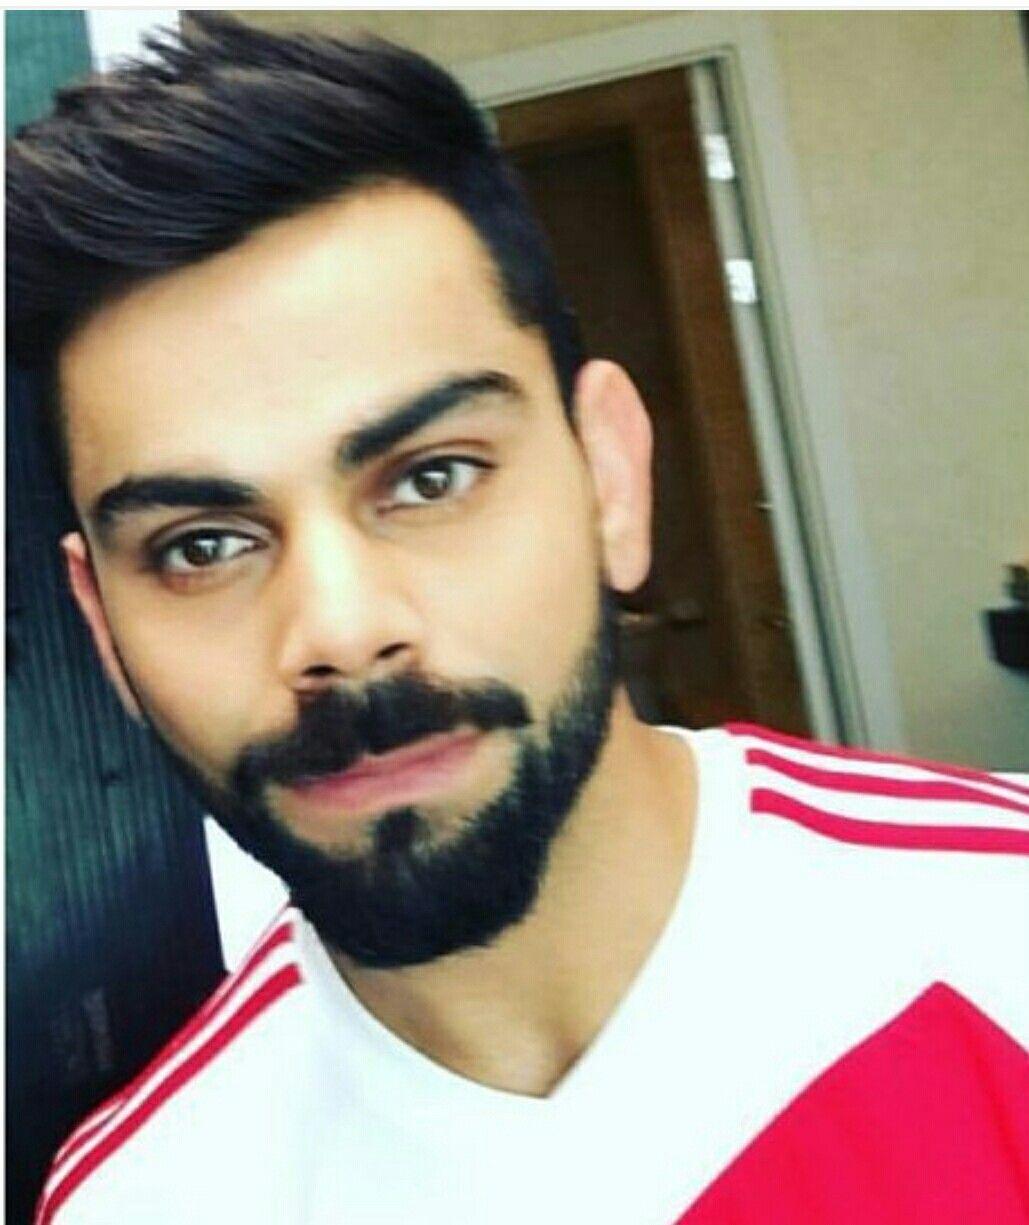 Virat Kohli Luv Virat Kohli Virat Kohli Cricket Virat Kohli Beard